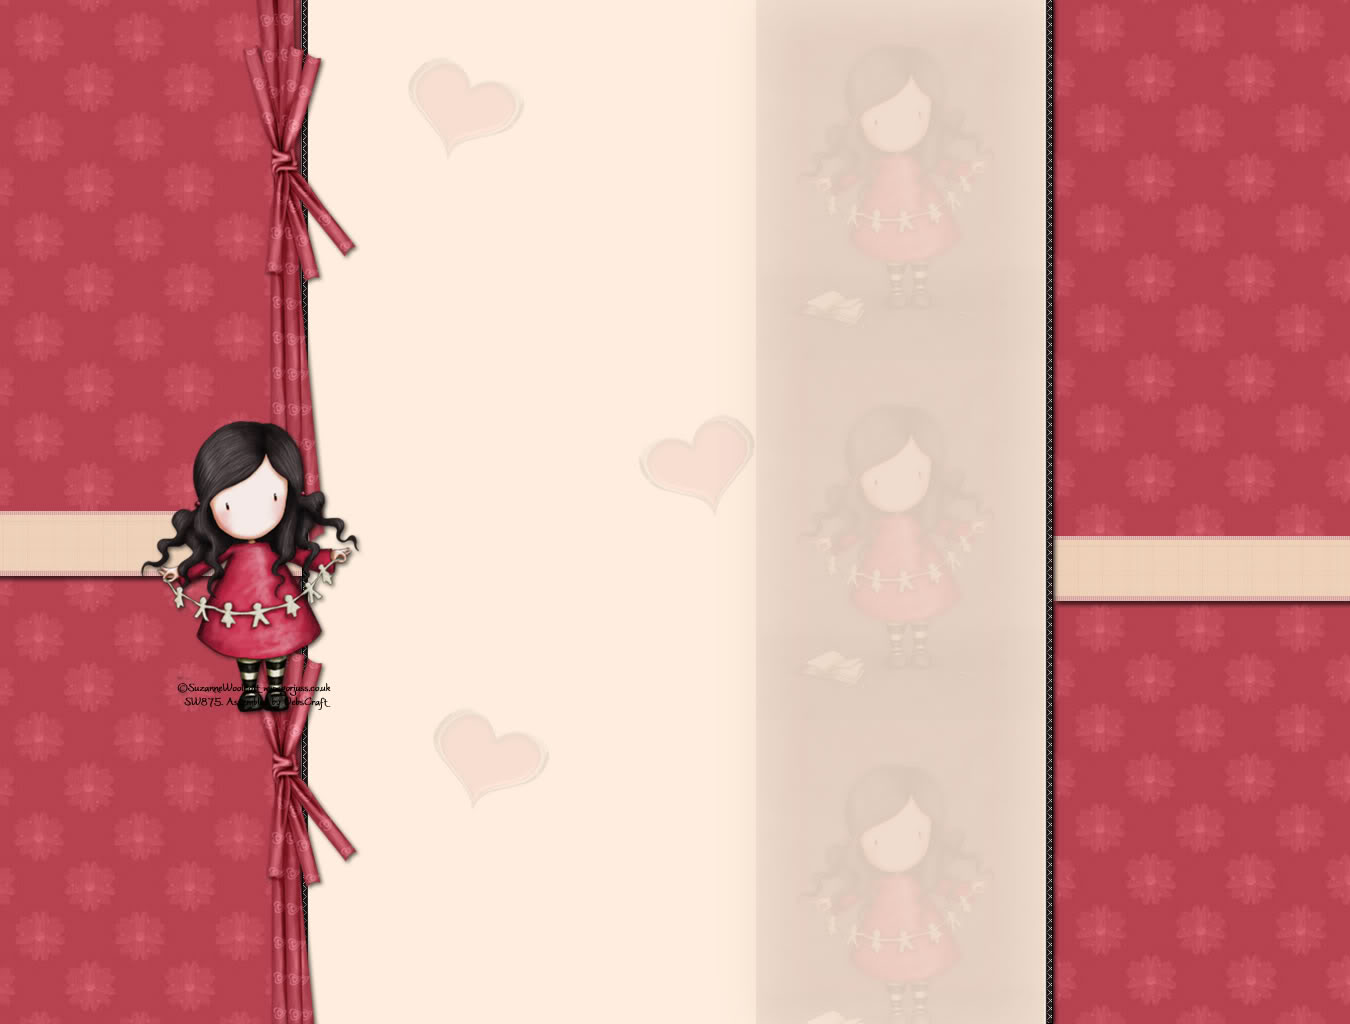 dolls-background-3-720285.jpg